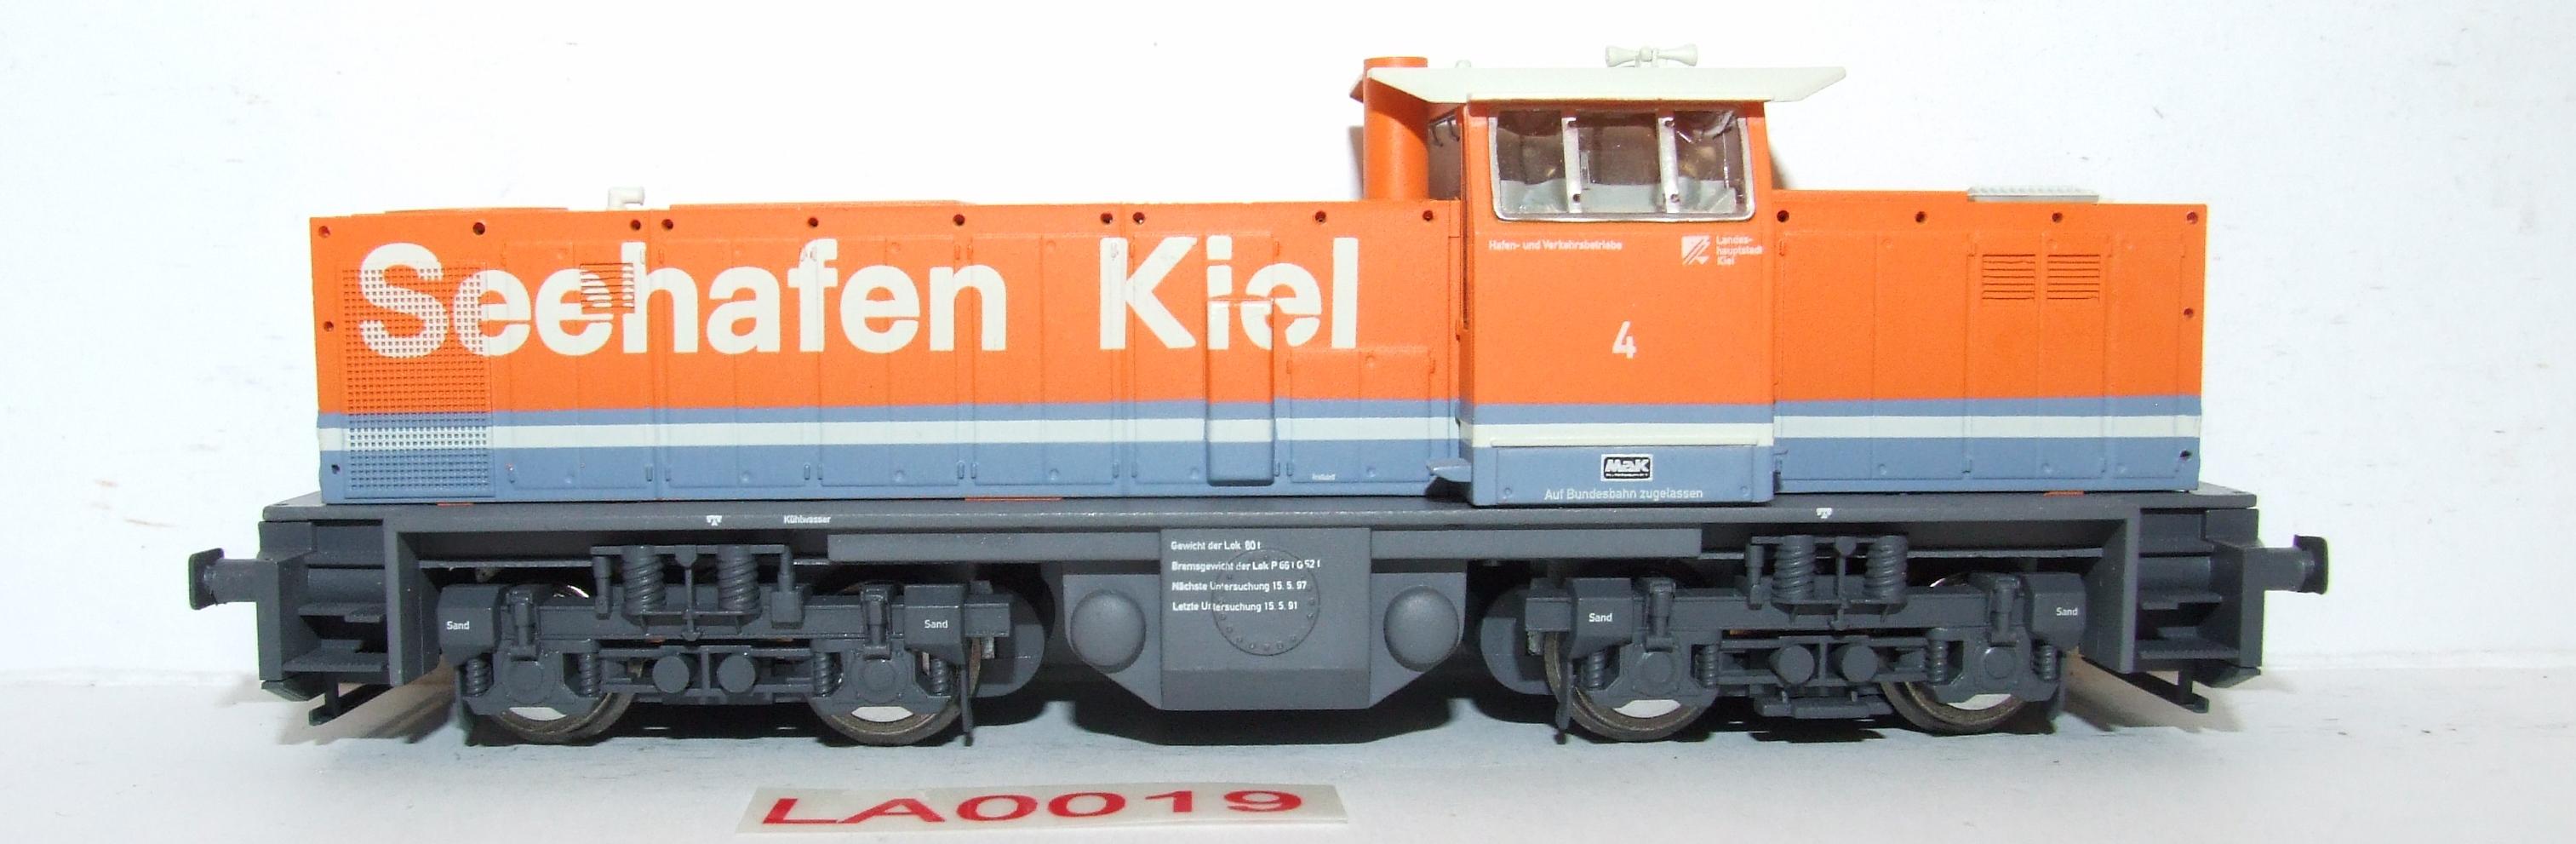 LA0019 Liliput H0 L 112410 Diesellok MAK Seehafen Kiel DC in OVP